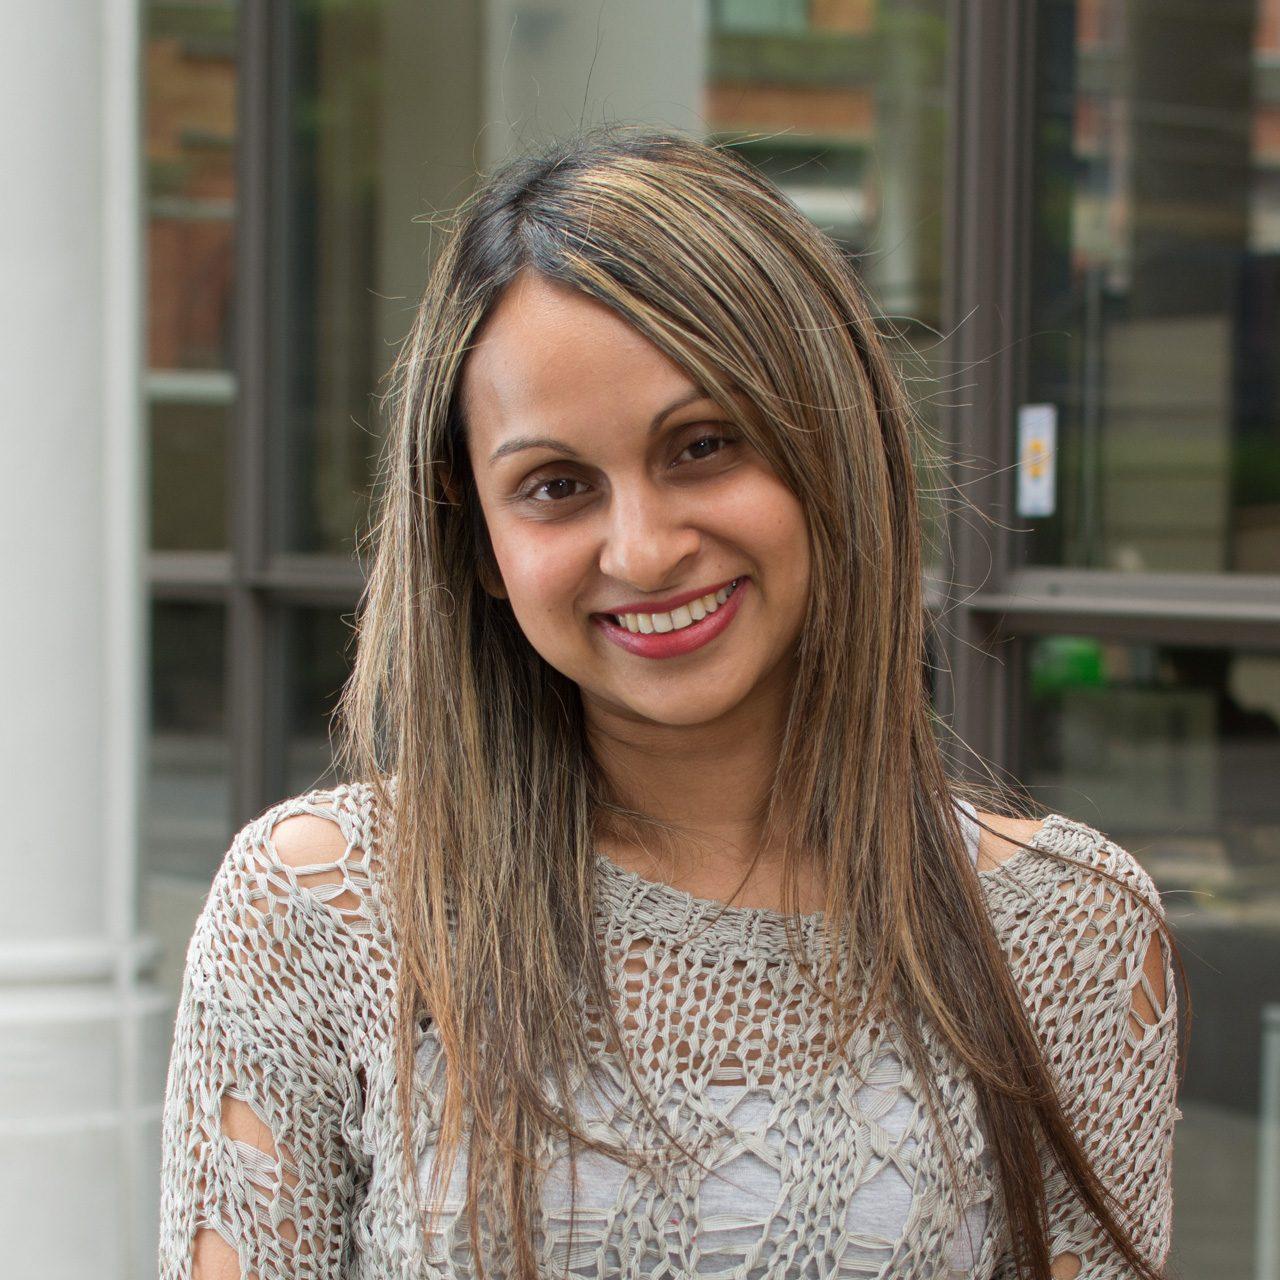 Tabby Bhuiyan